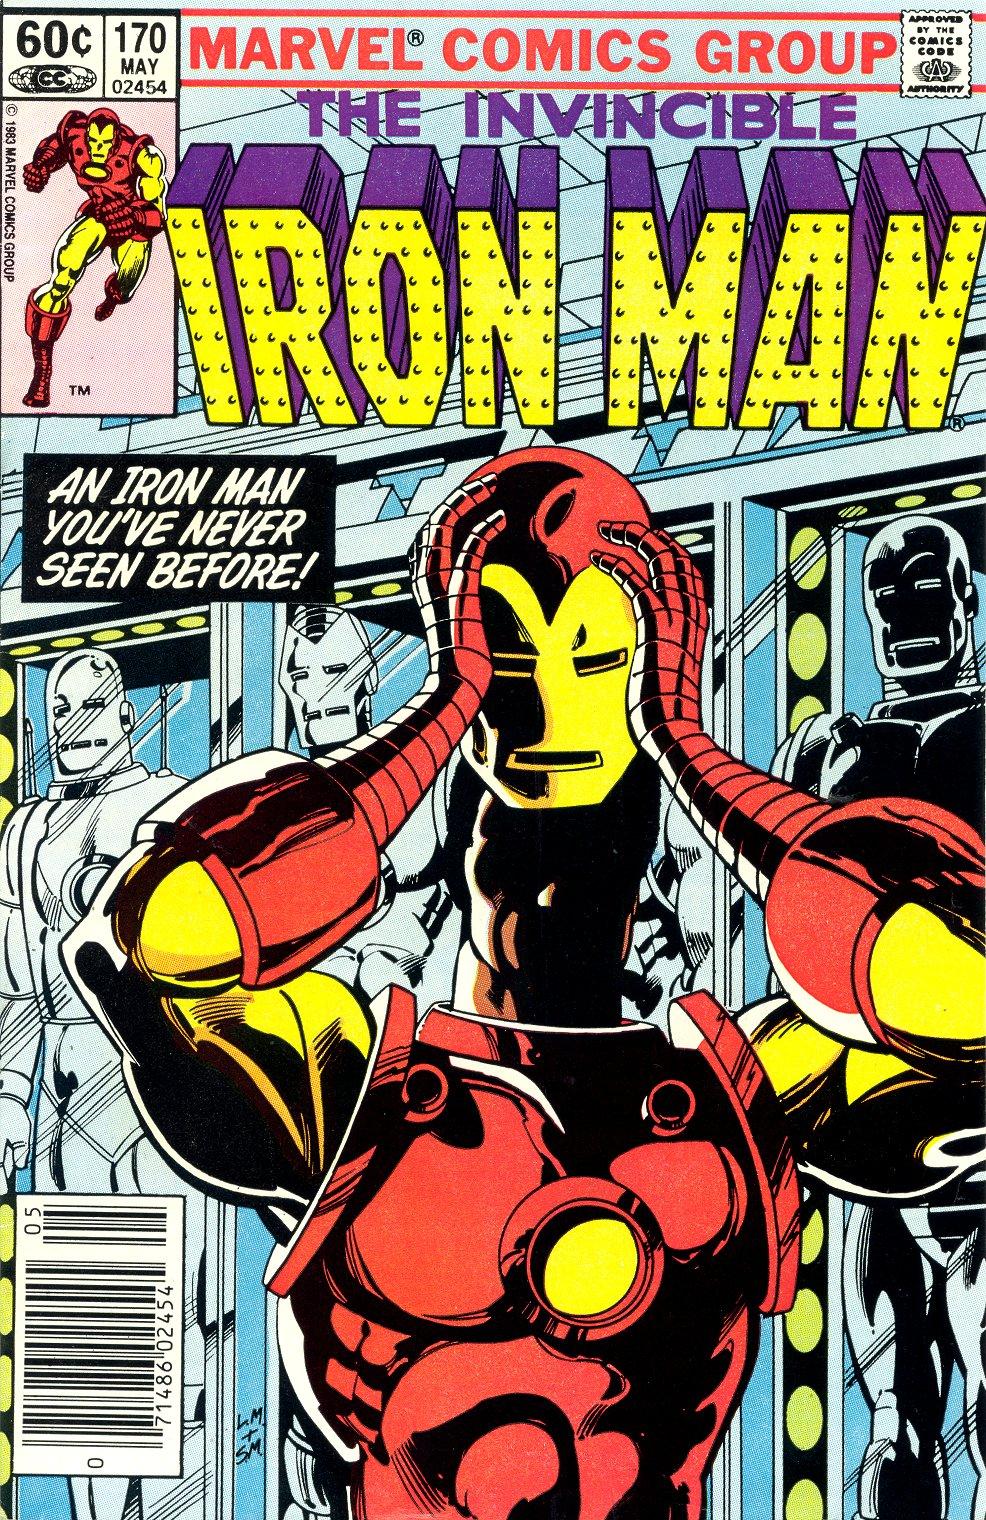 Marvel Comics Of The 1980s: Iron Man 3 Week